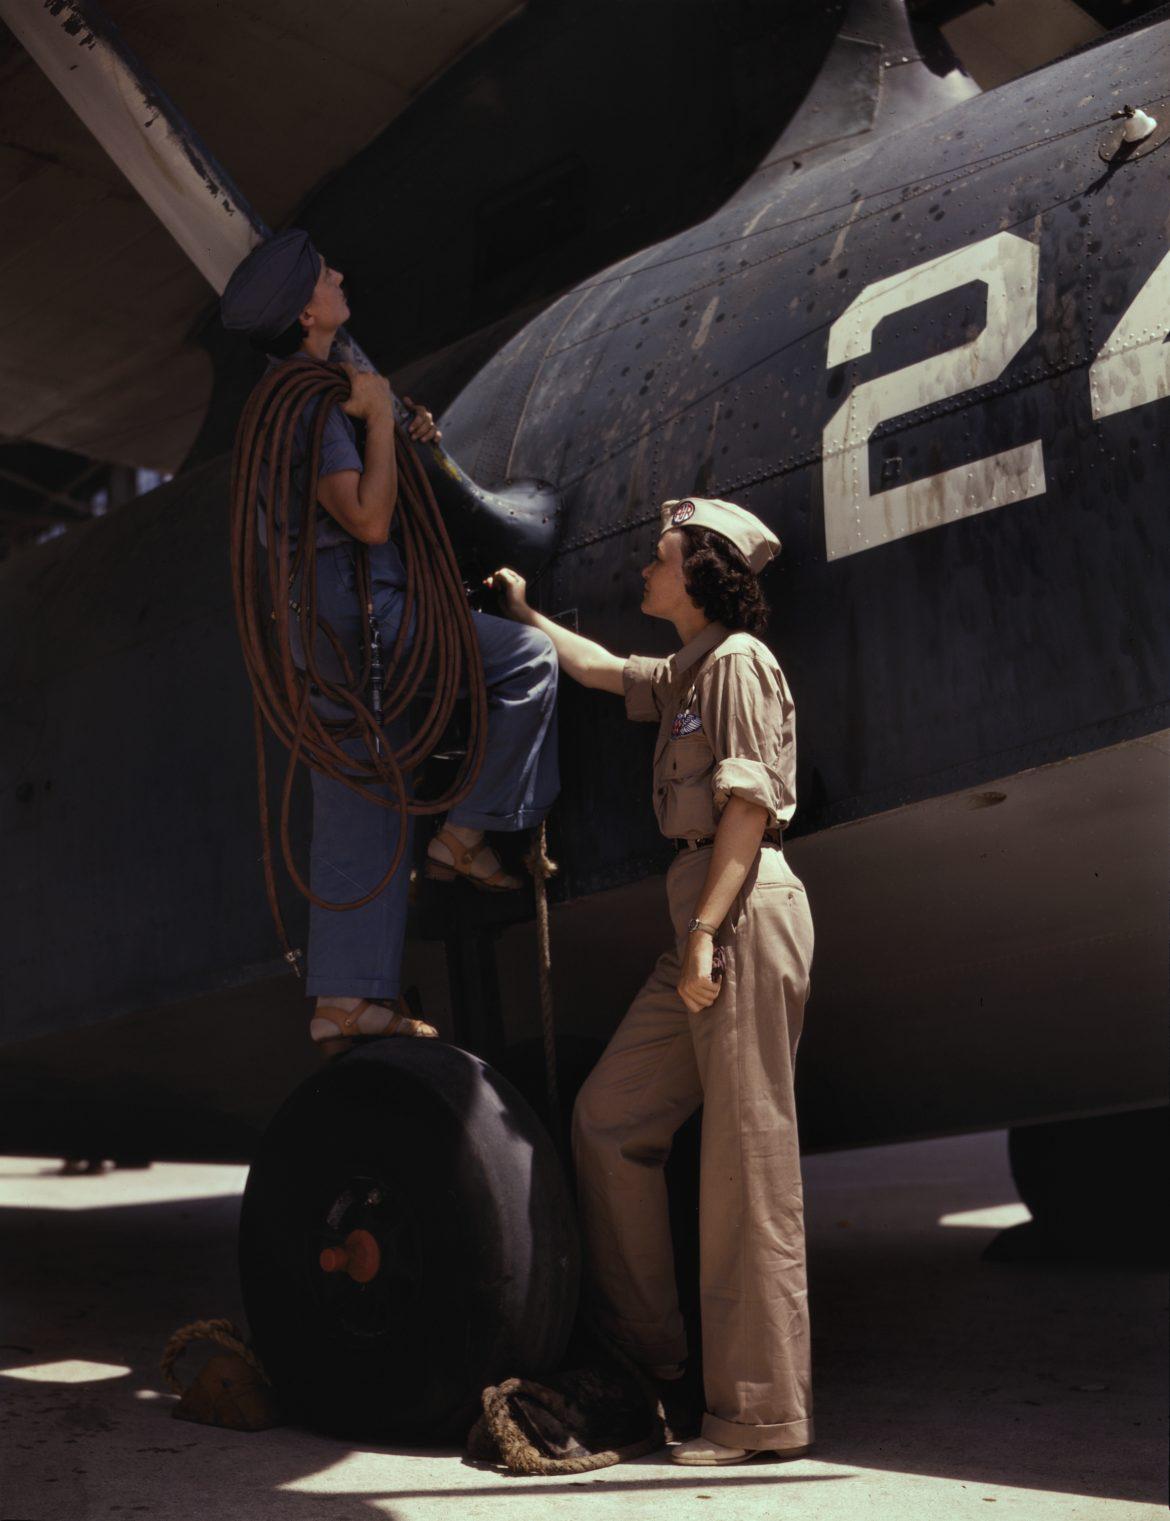 Woman Works as Cowler at Naval Air Base